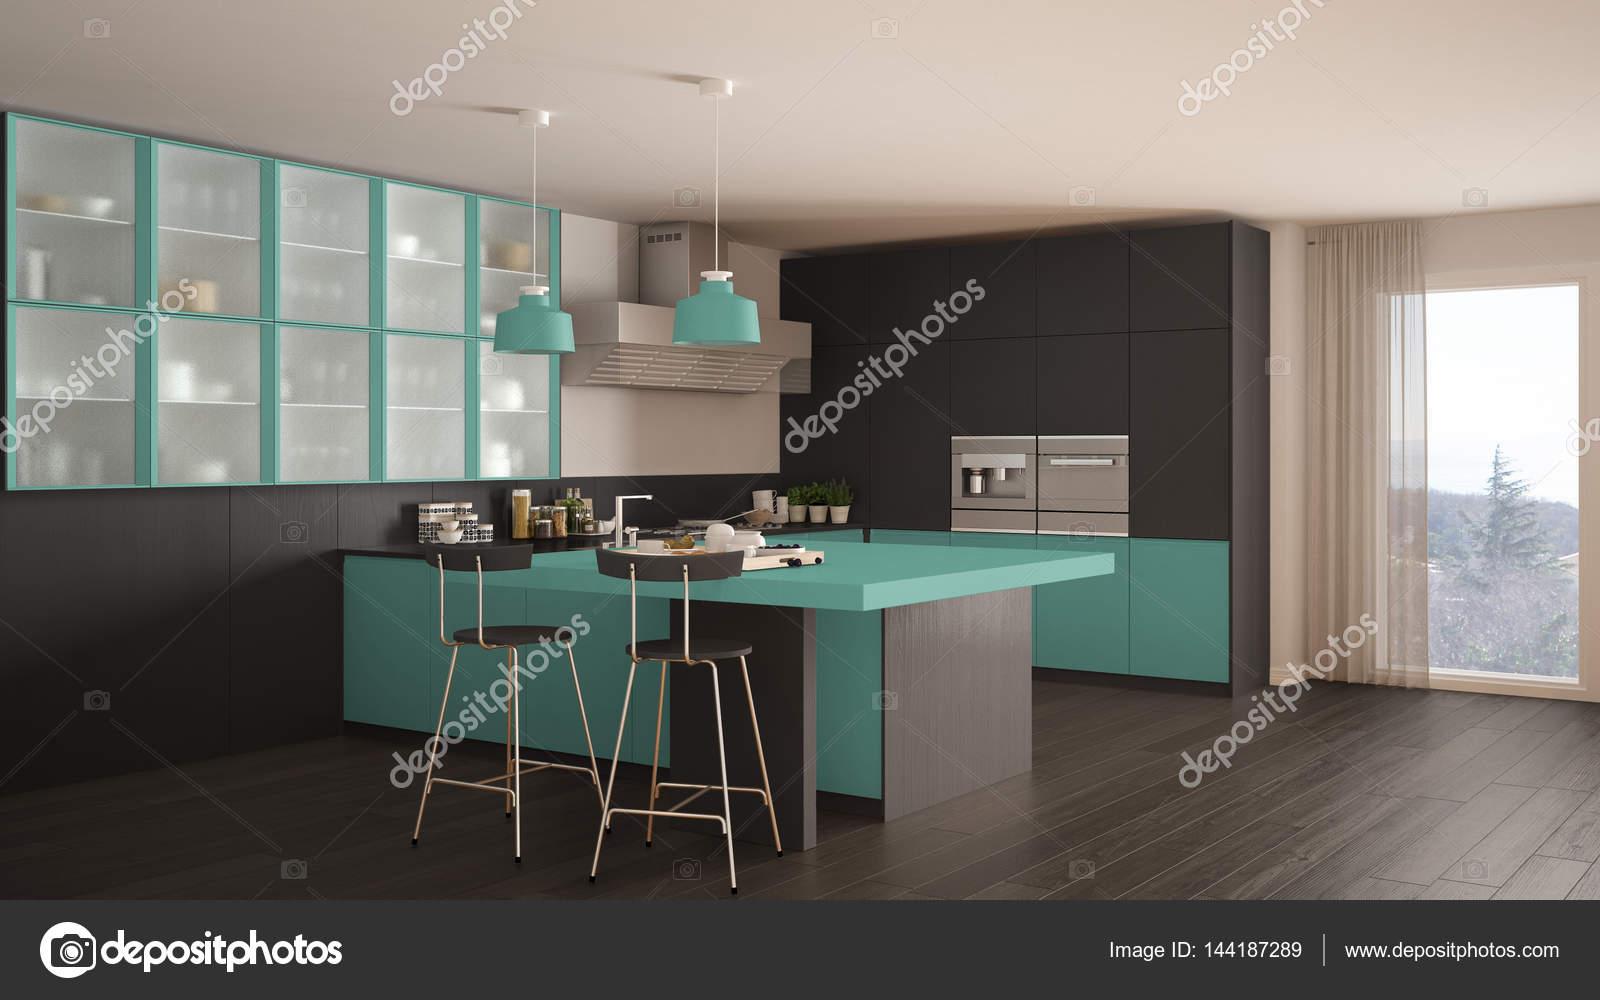 turquoise kitchen decor shears 经典的最小灰和绿松石厨房 镶木地板 m 图库照片 c archiviz 144187289 图库